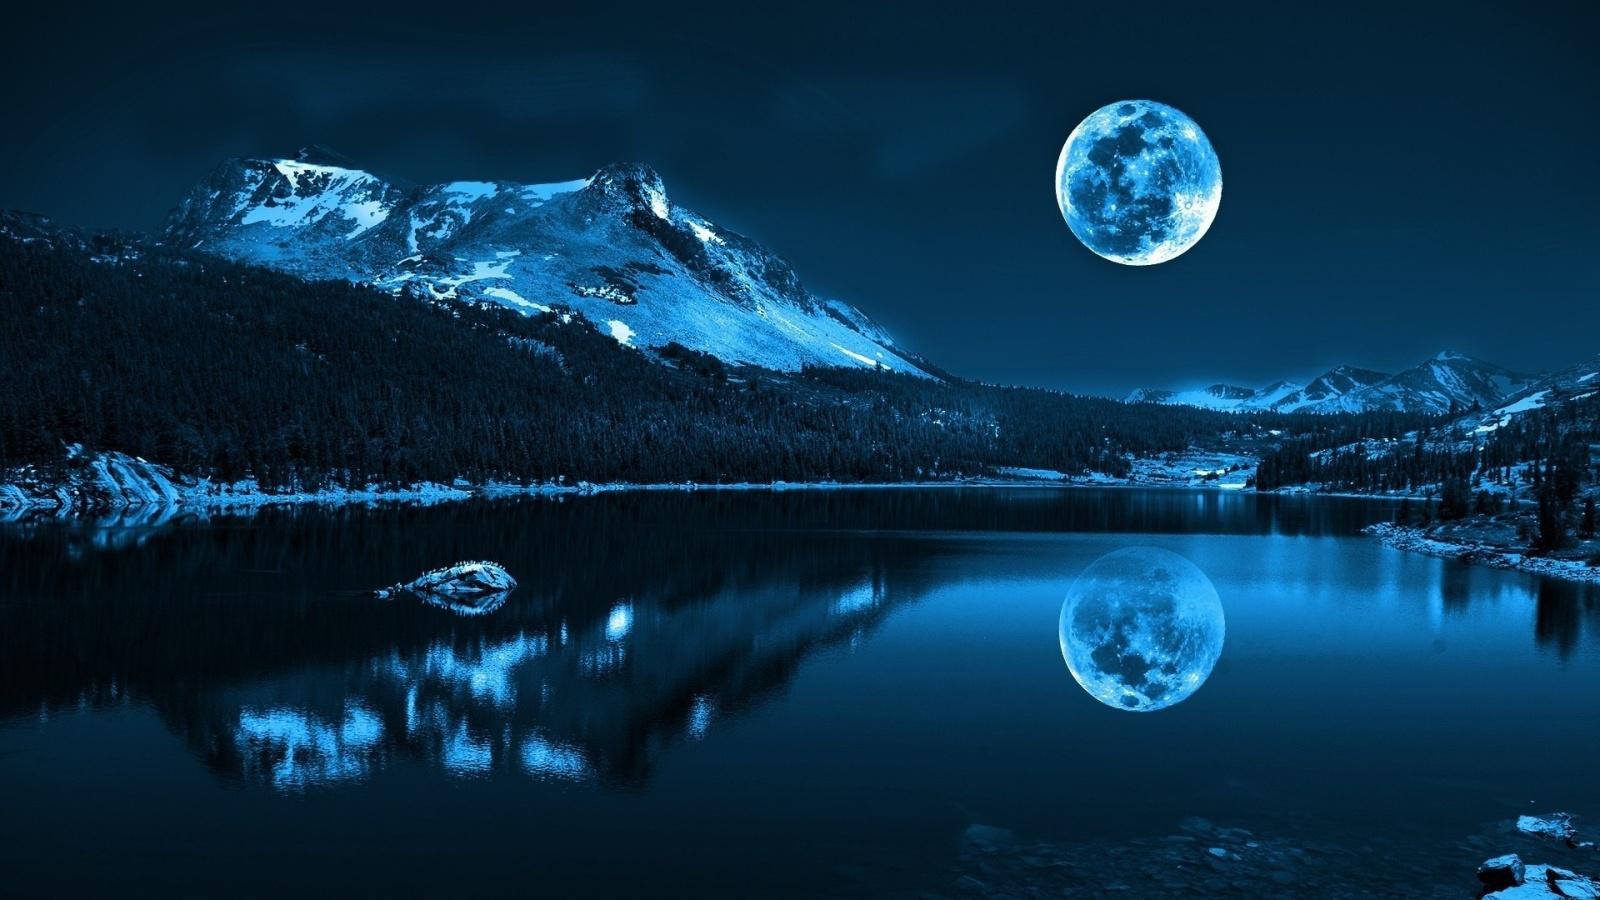 moon hd wallpaper pattimccormick